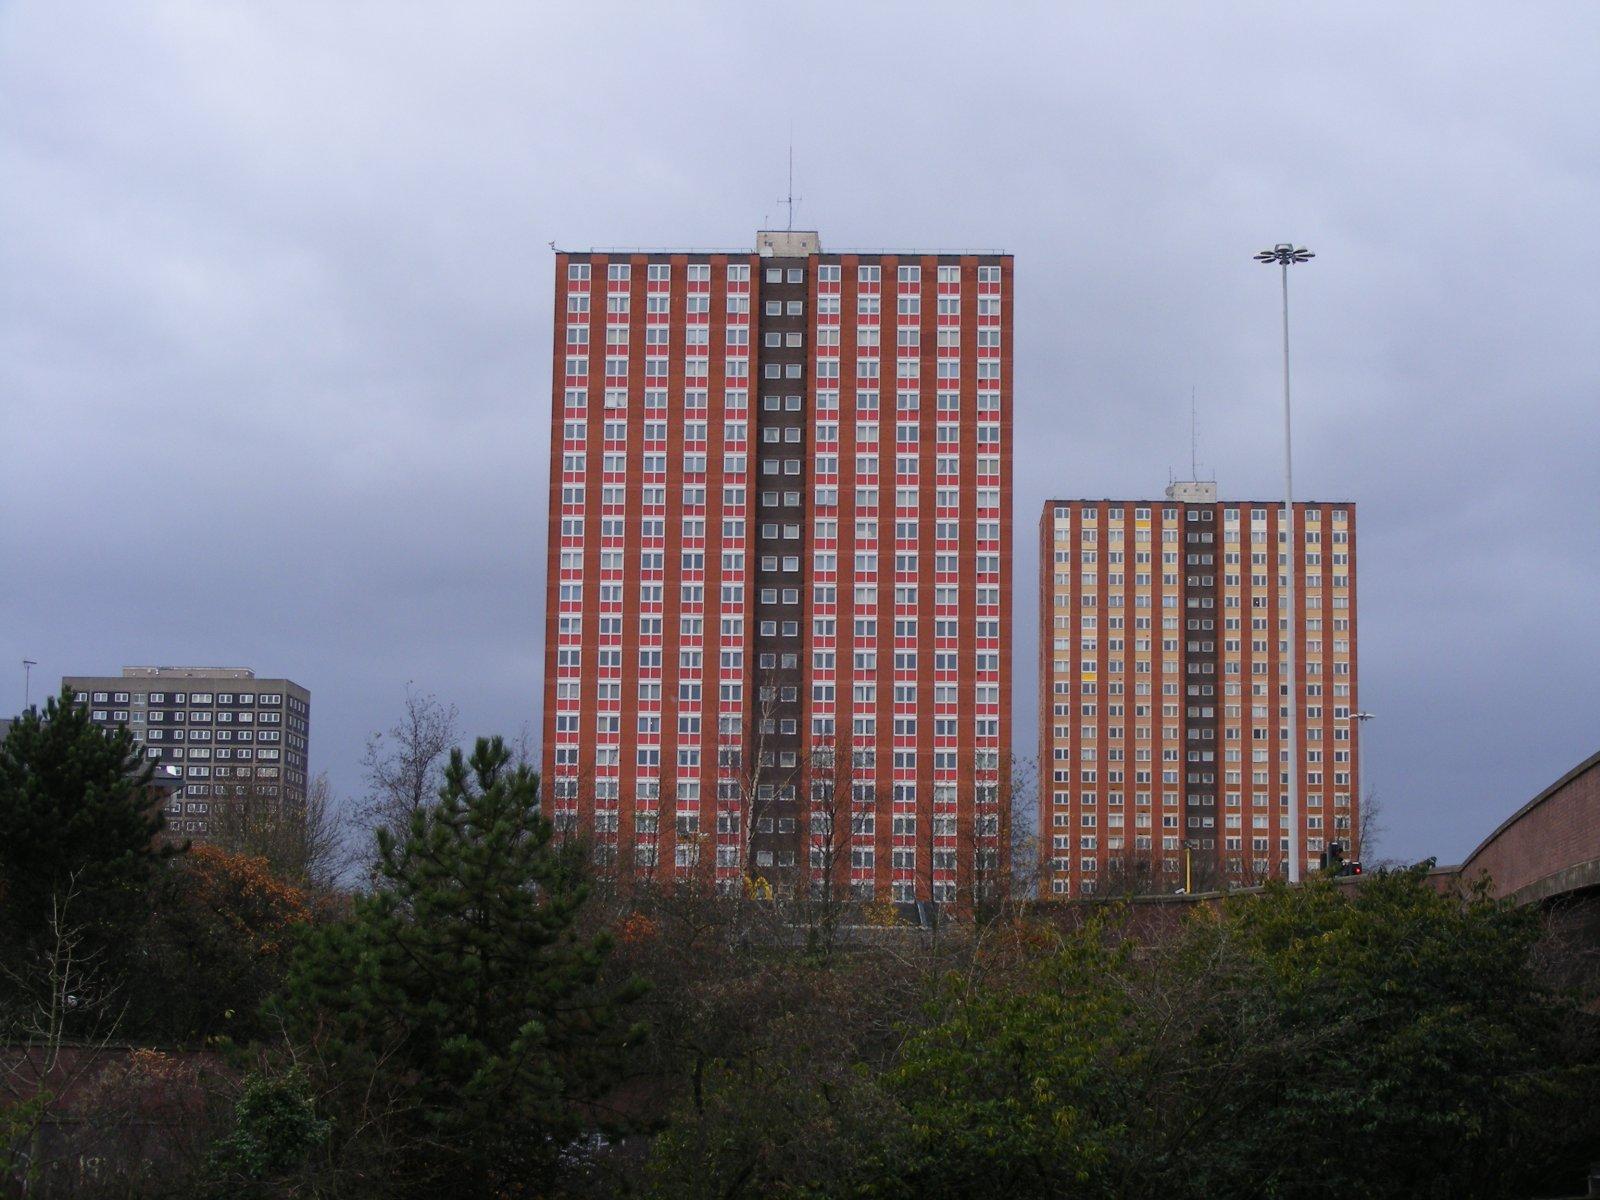 Salford tower